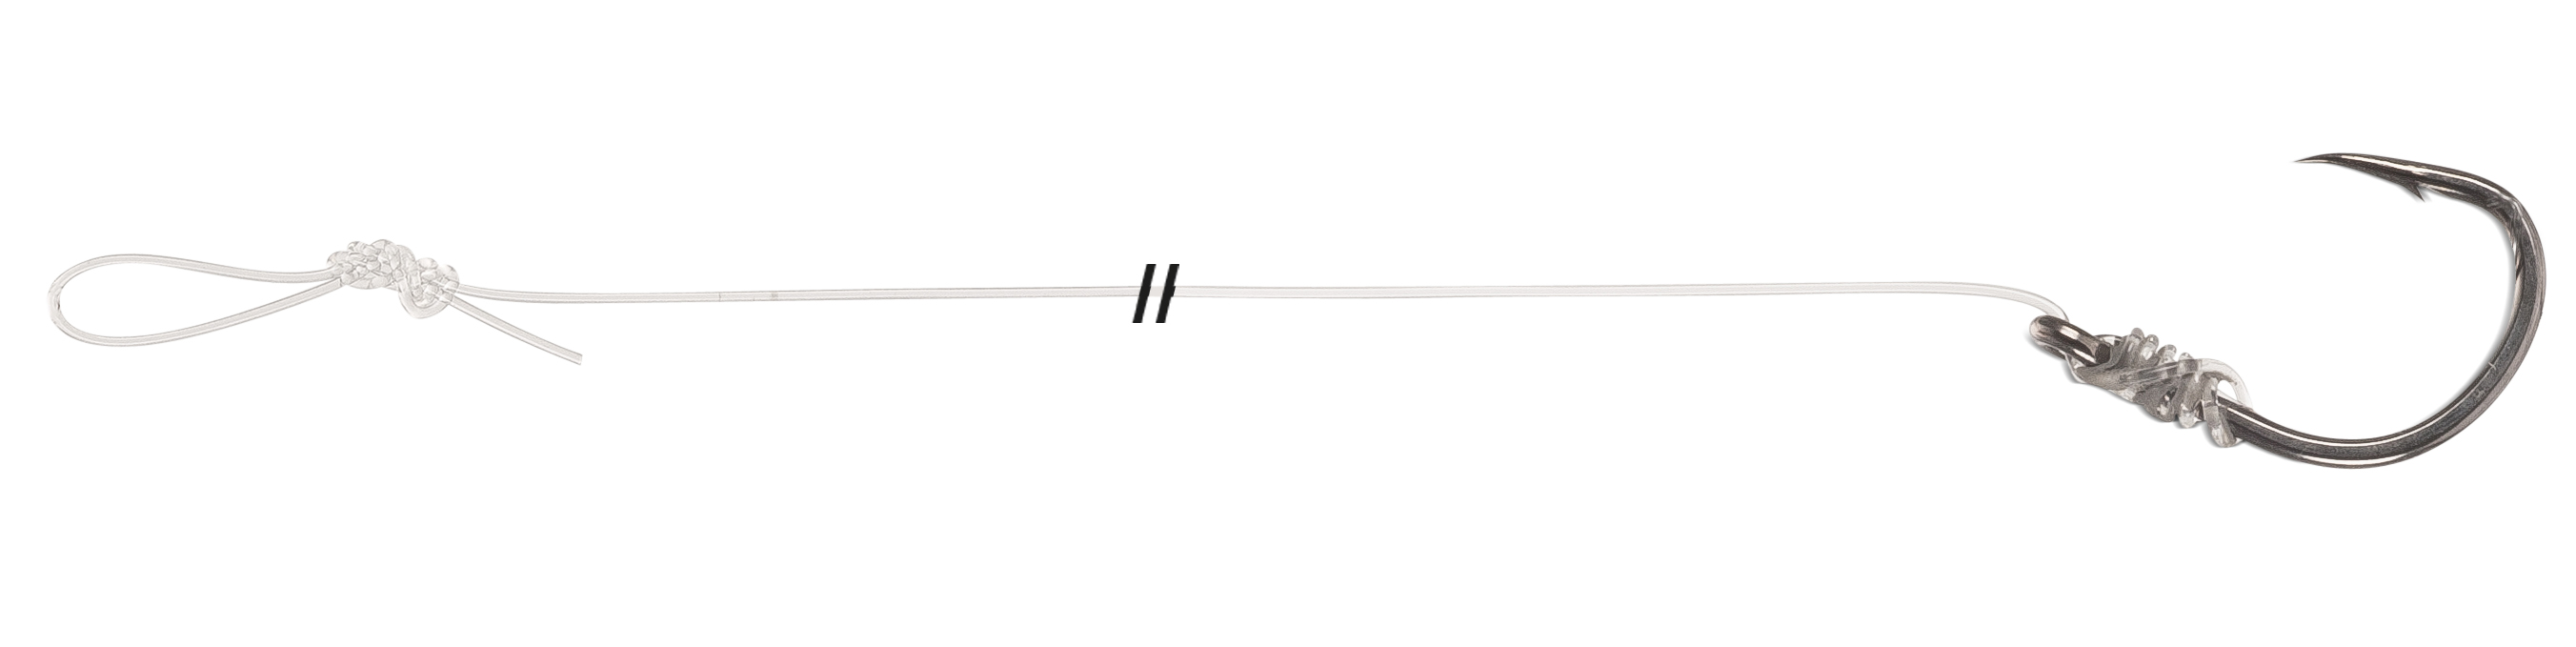 Návazec Uni Cat  S-Hook Mono Rig Velikost 2/0